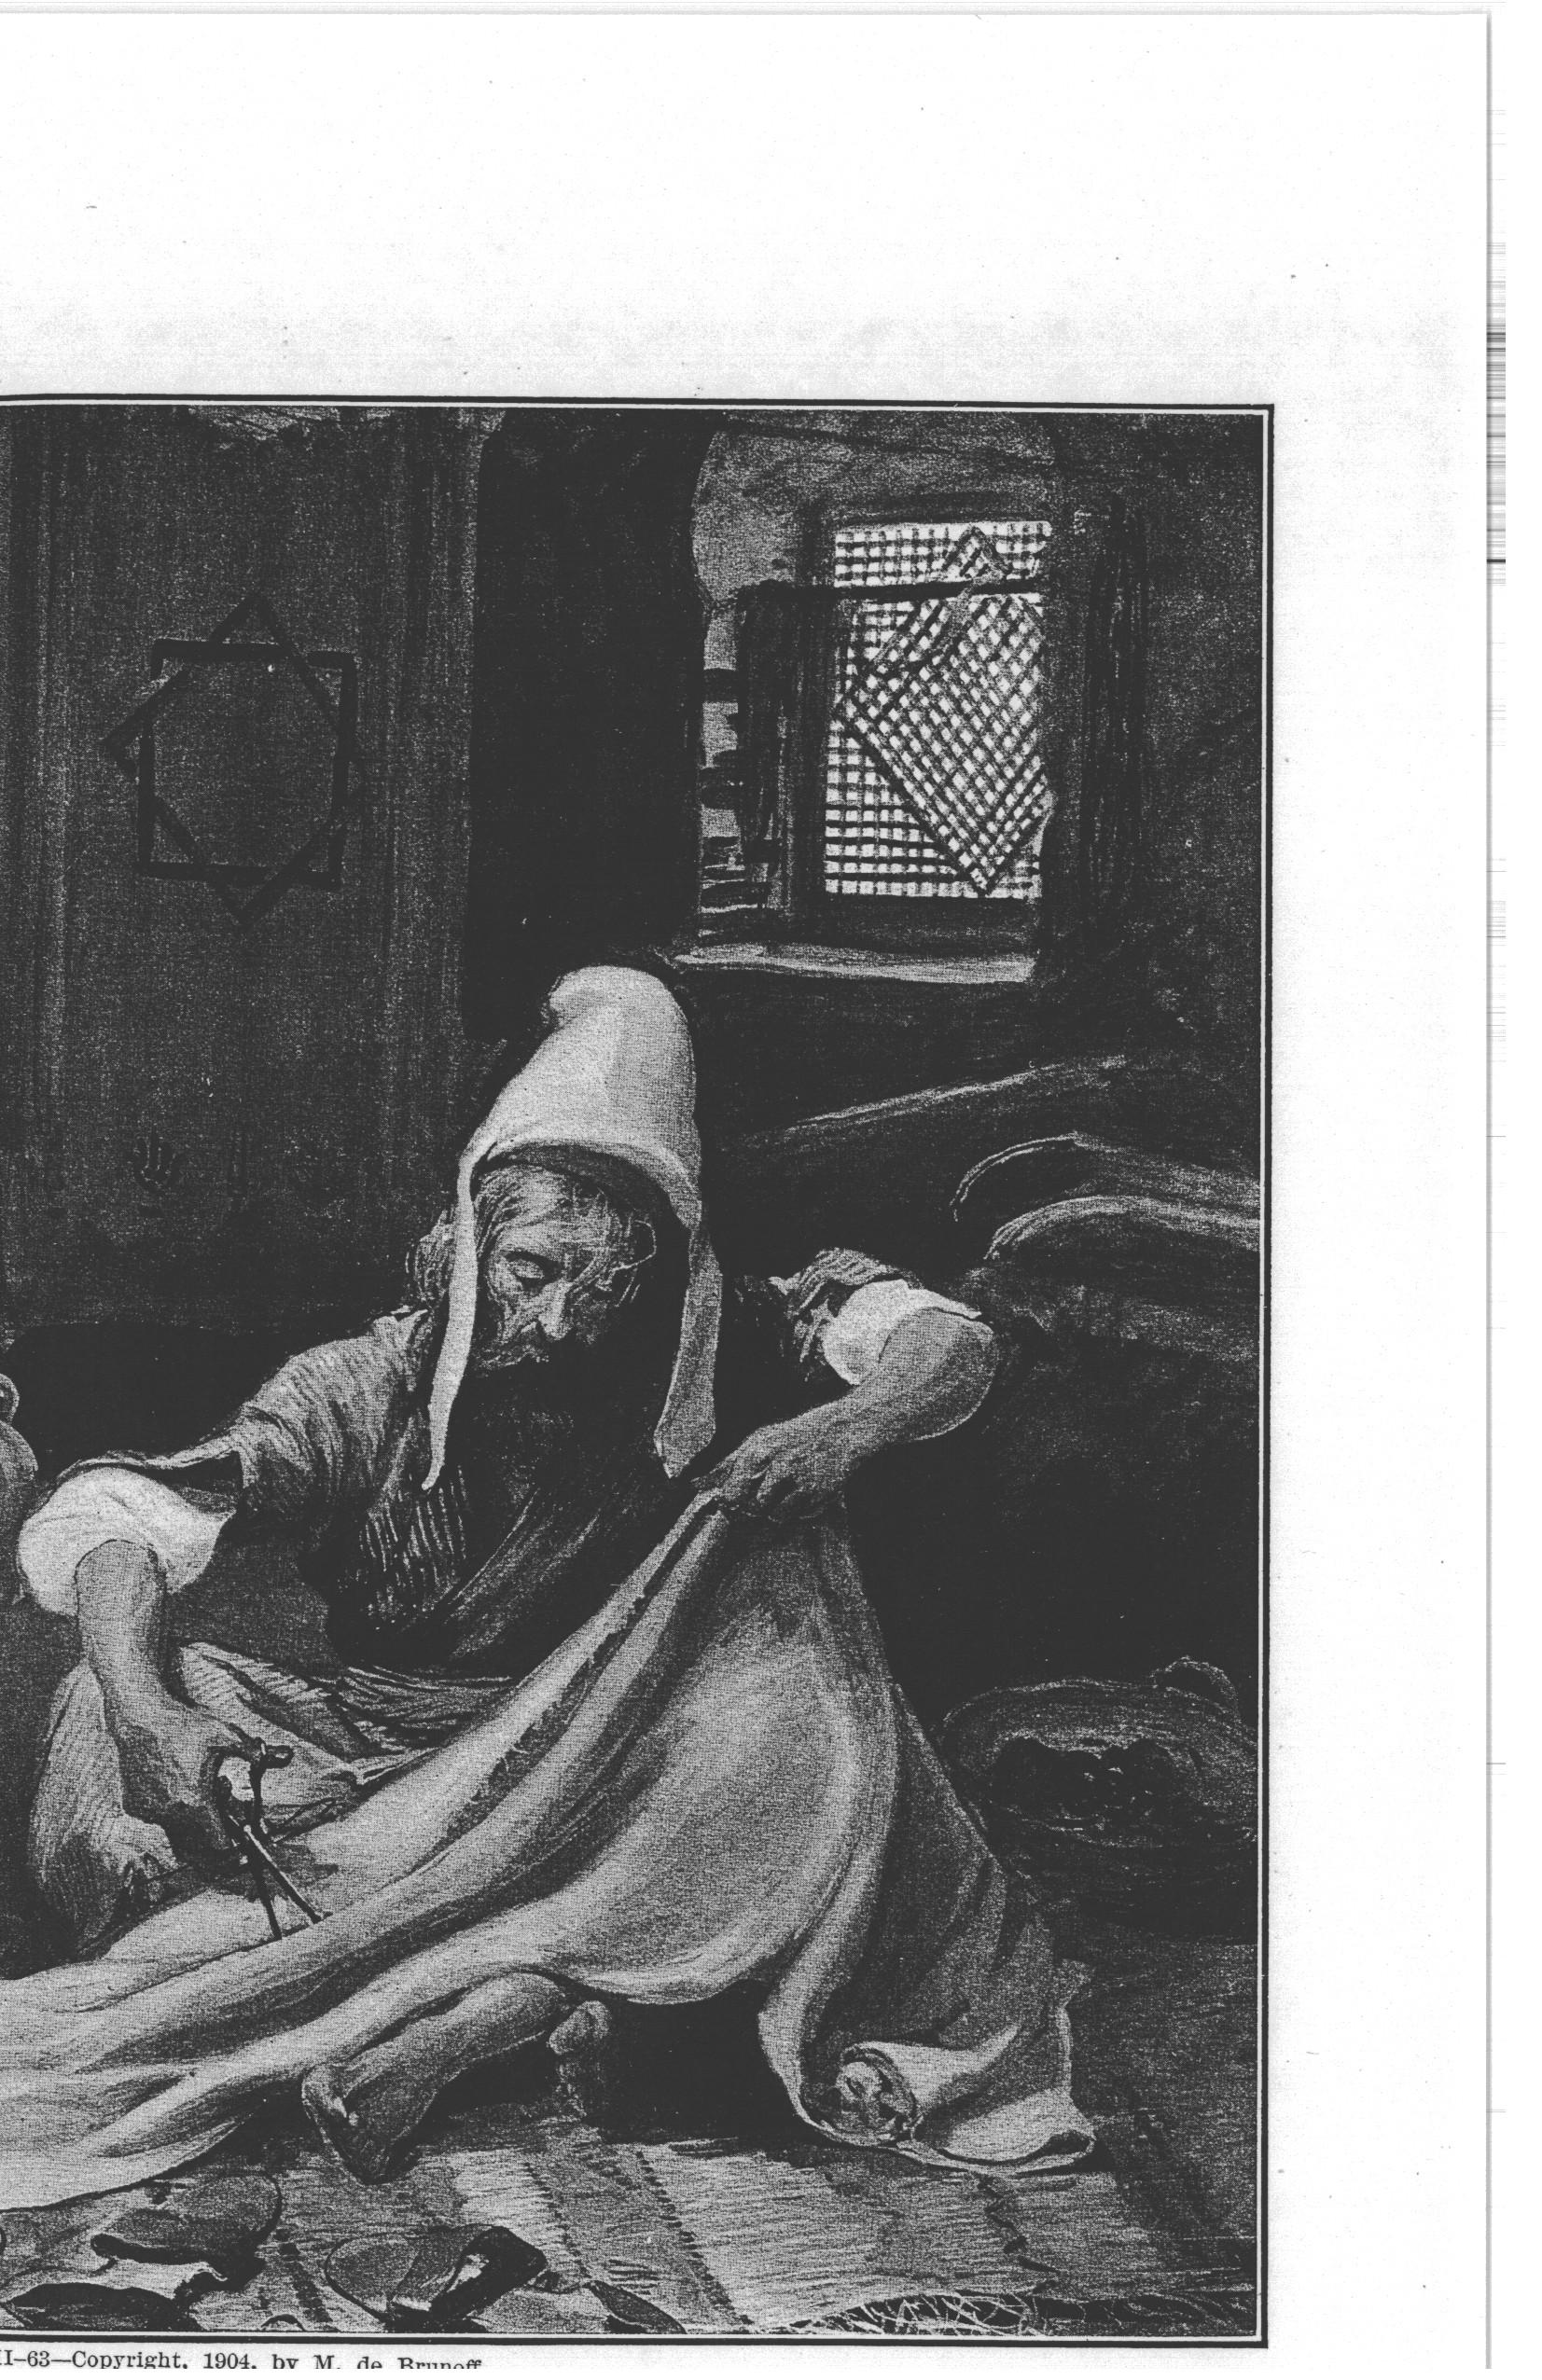 Aholiab, son of Ahisamach(Danite)_art by James Tissot